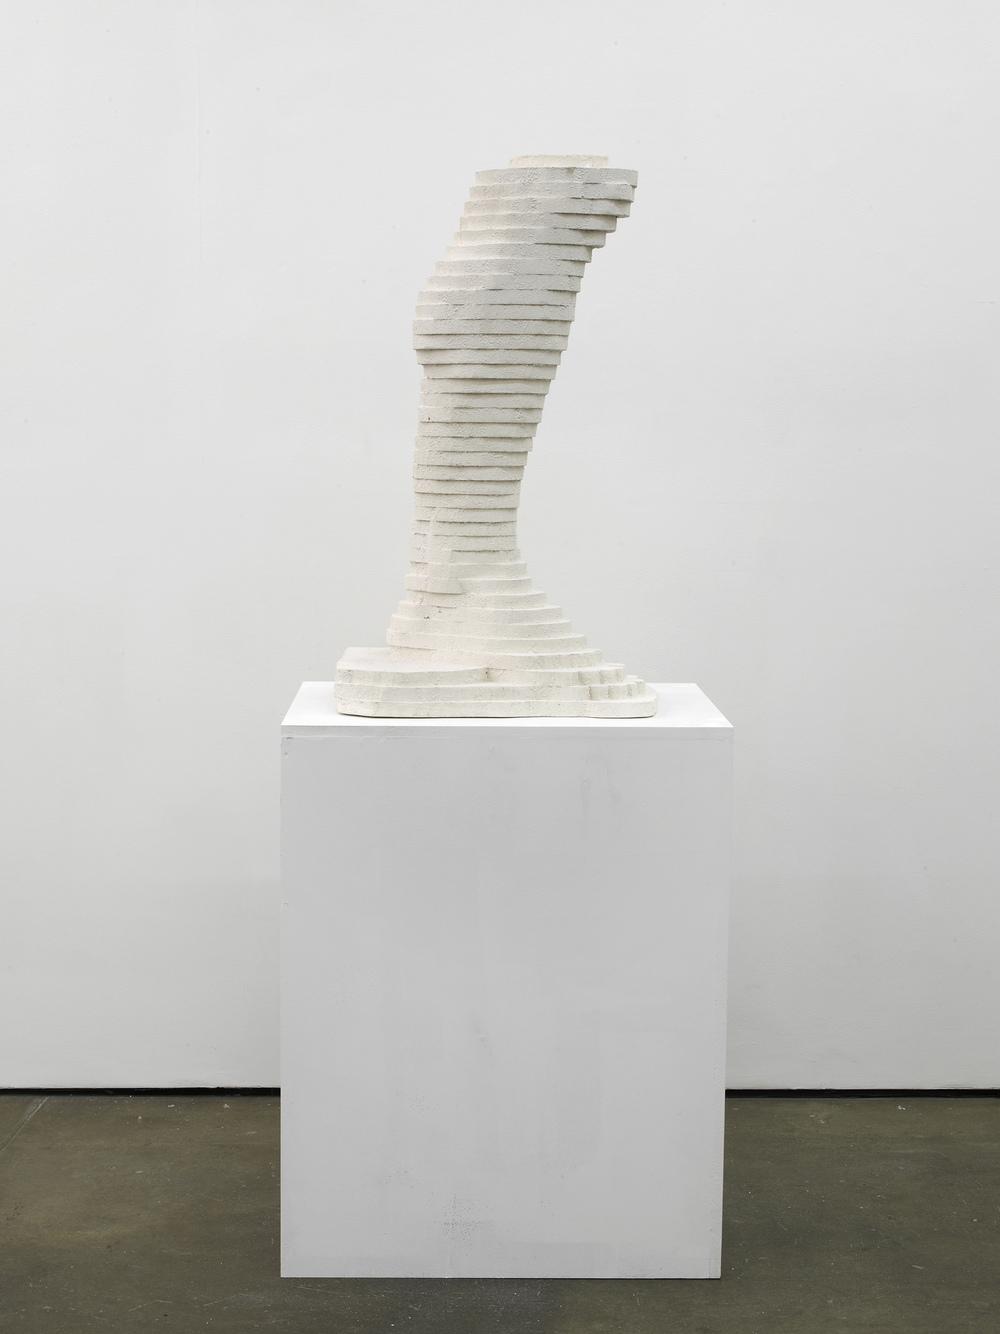 Hercules Foot 2014 Plaster 92 x 52 x 42 cm / 36.2 x 20.4 x 16.5 in